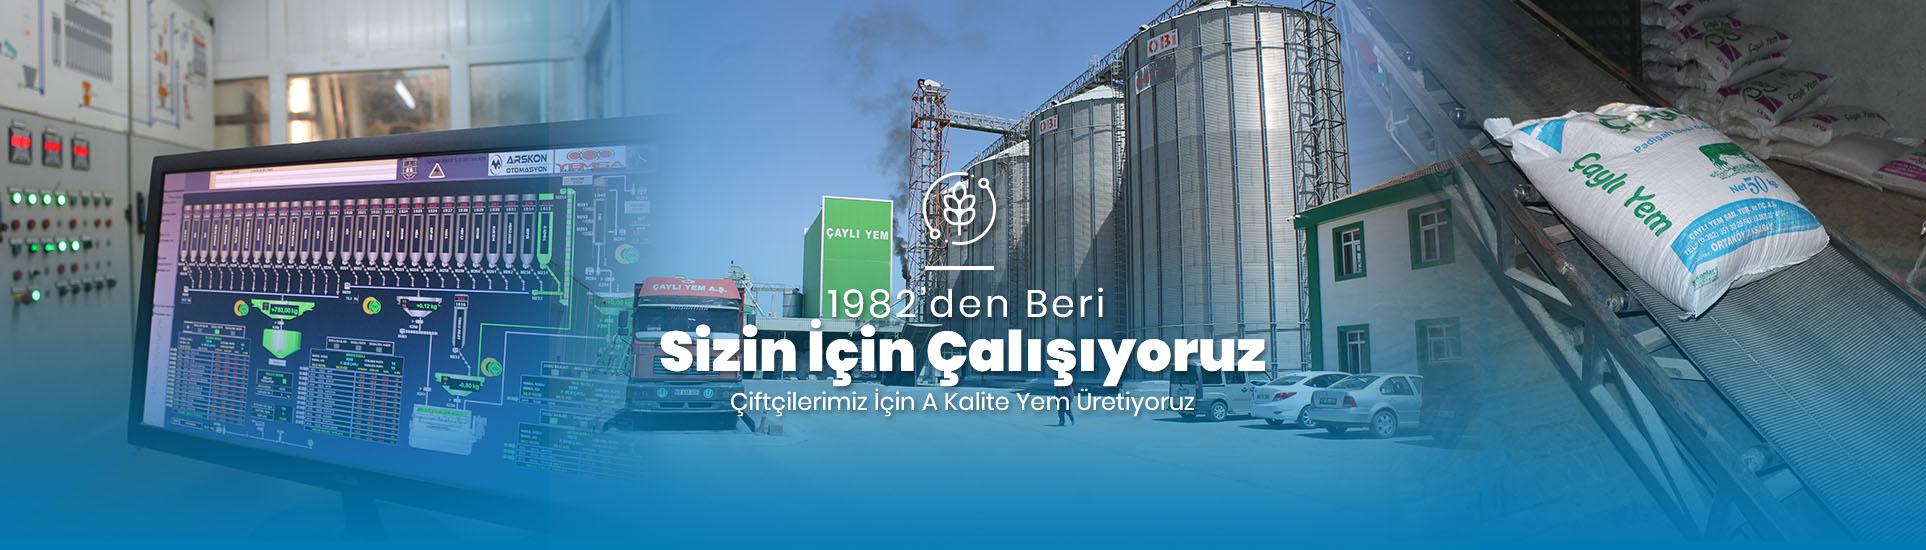 http://www.cayliyem.com.tr/Slayt - 3